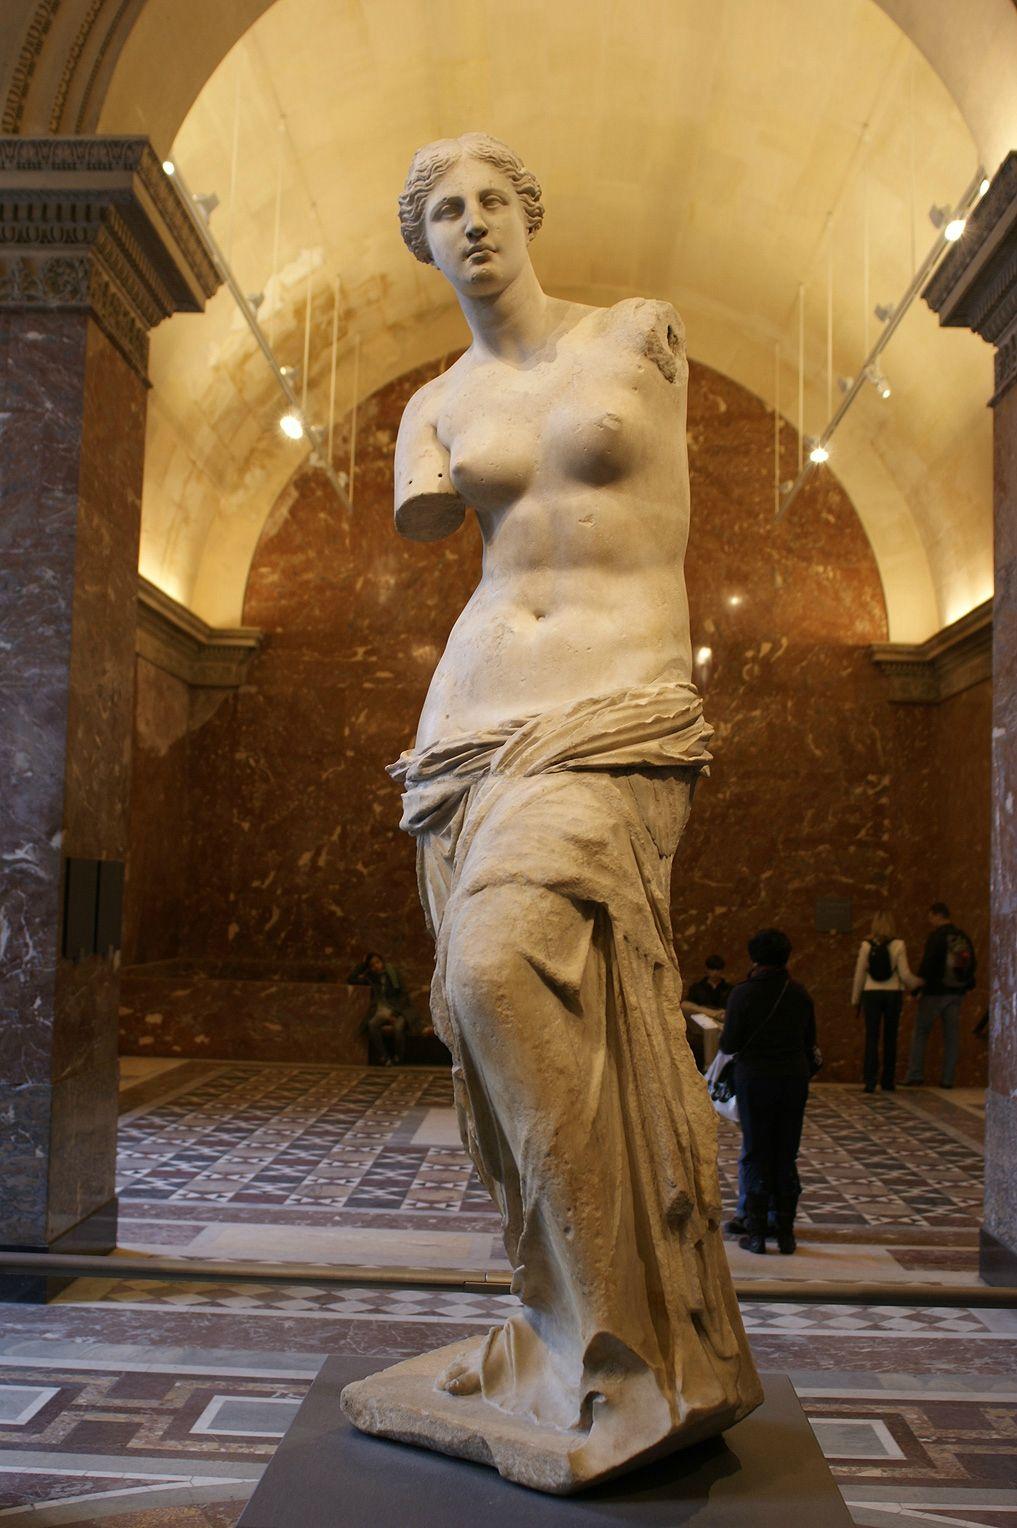 Le-Louvre---Venus-de-Milo